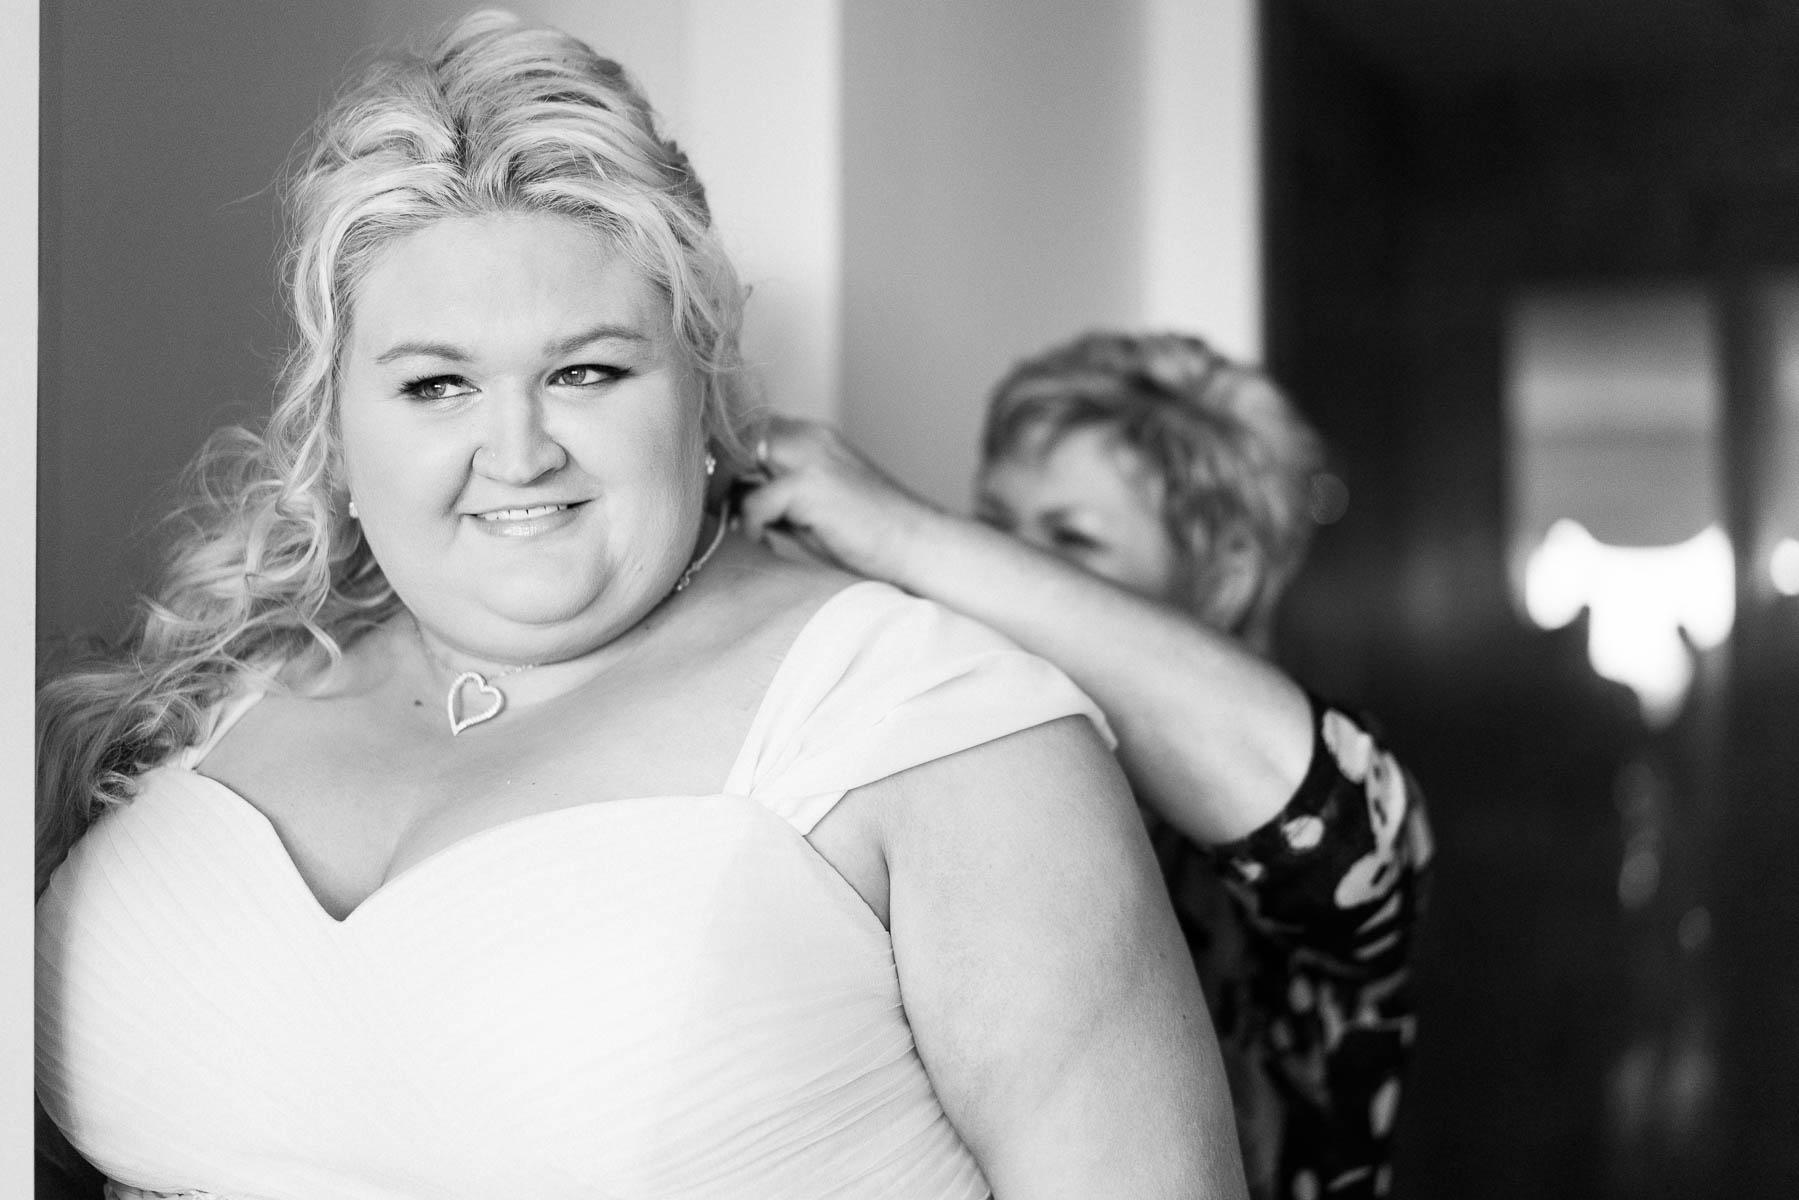 mt-eliza-mornington-peninsula-backyard-wedding-heart+soul-weddings-allison-matt-03008.jpg